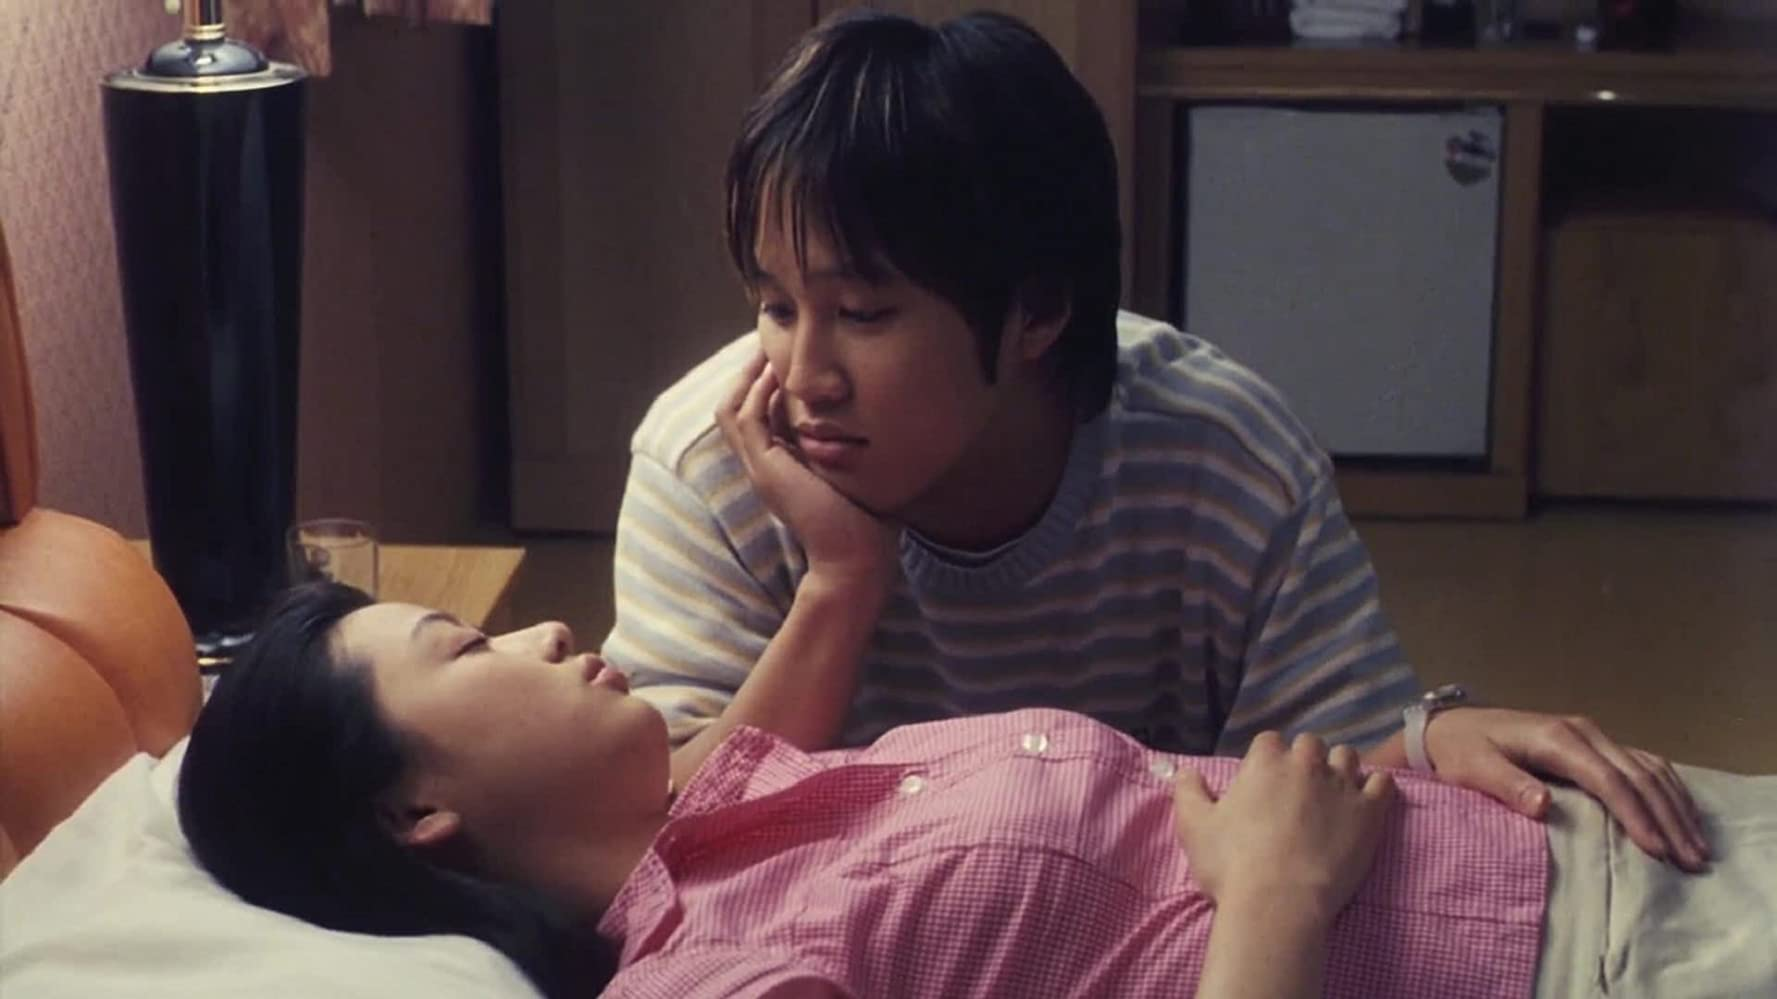 Películas imprescindibles para entender el cine coreano: My Sassy Girl (2001)